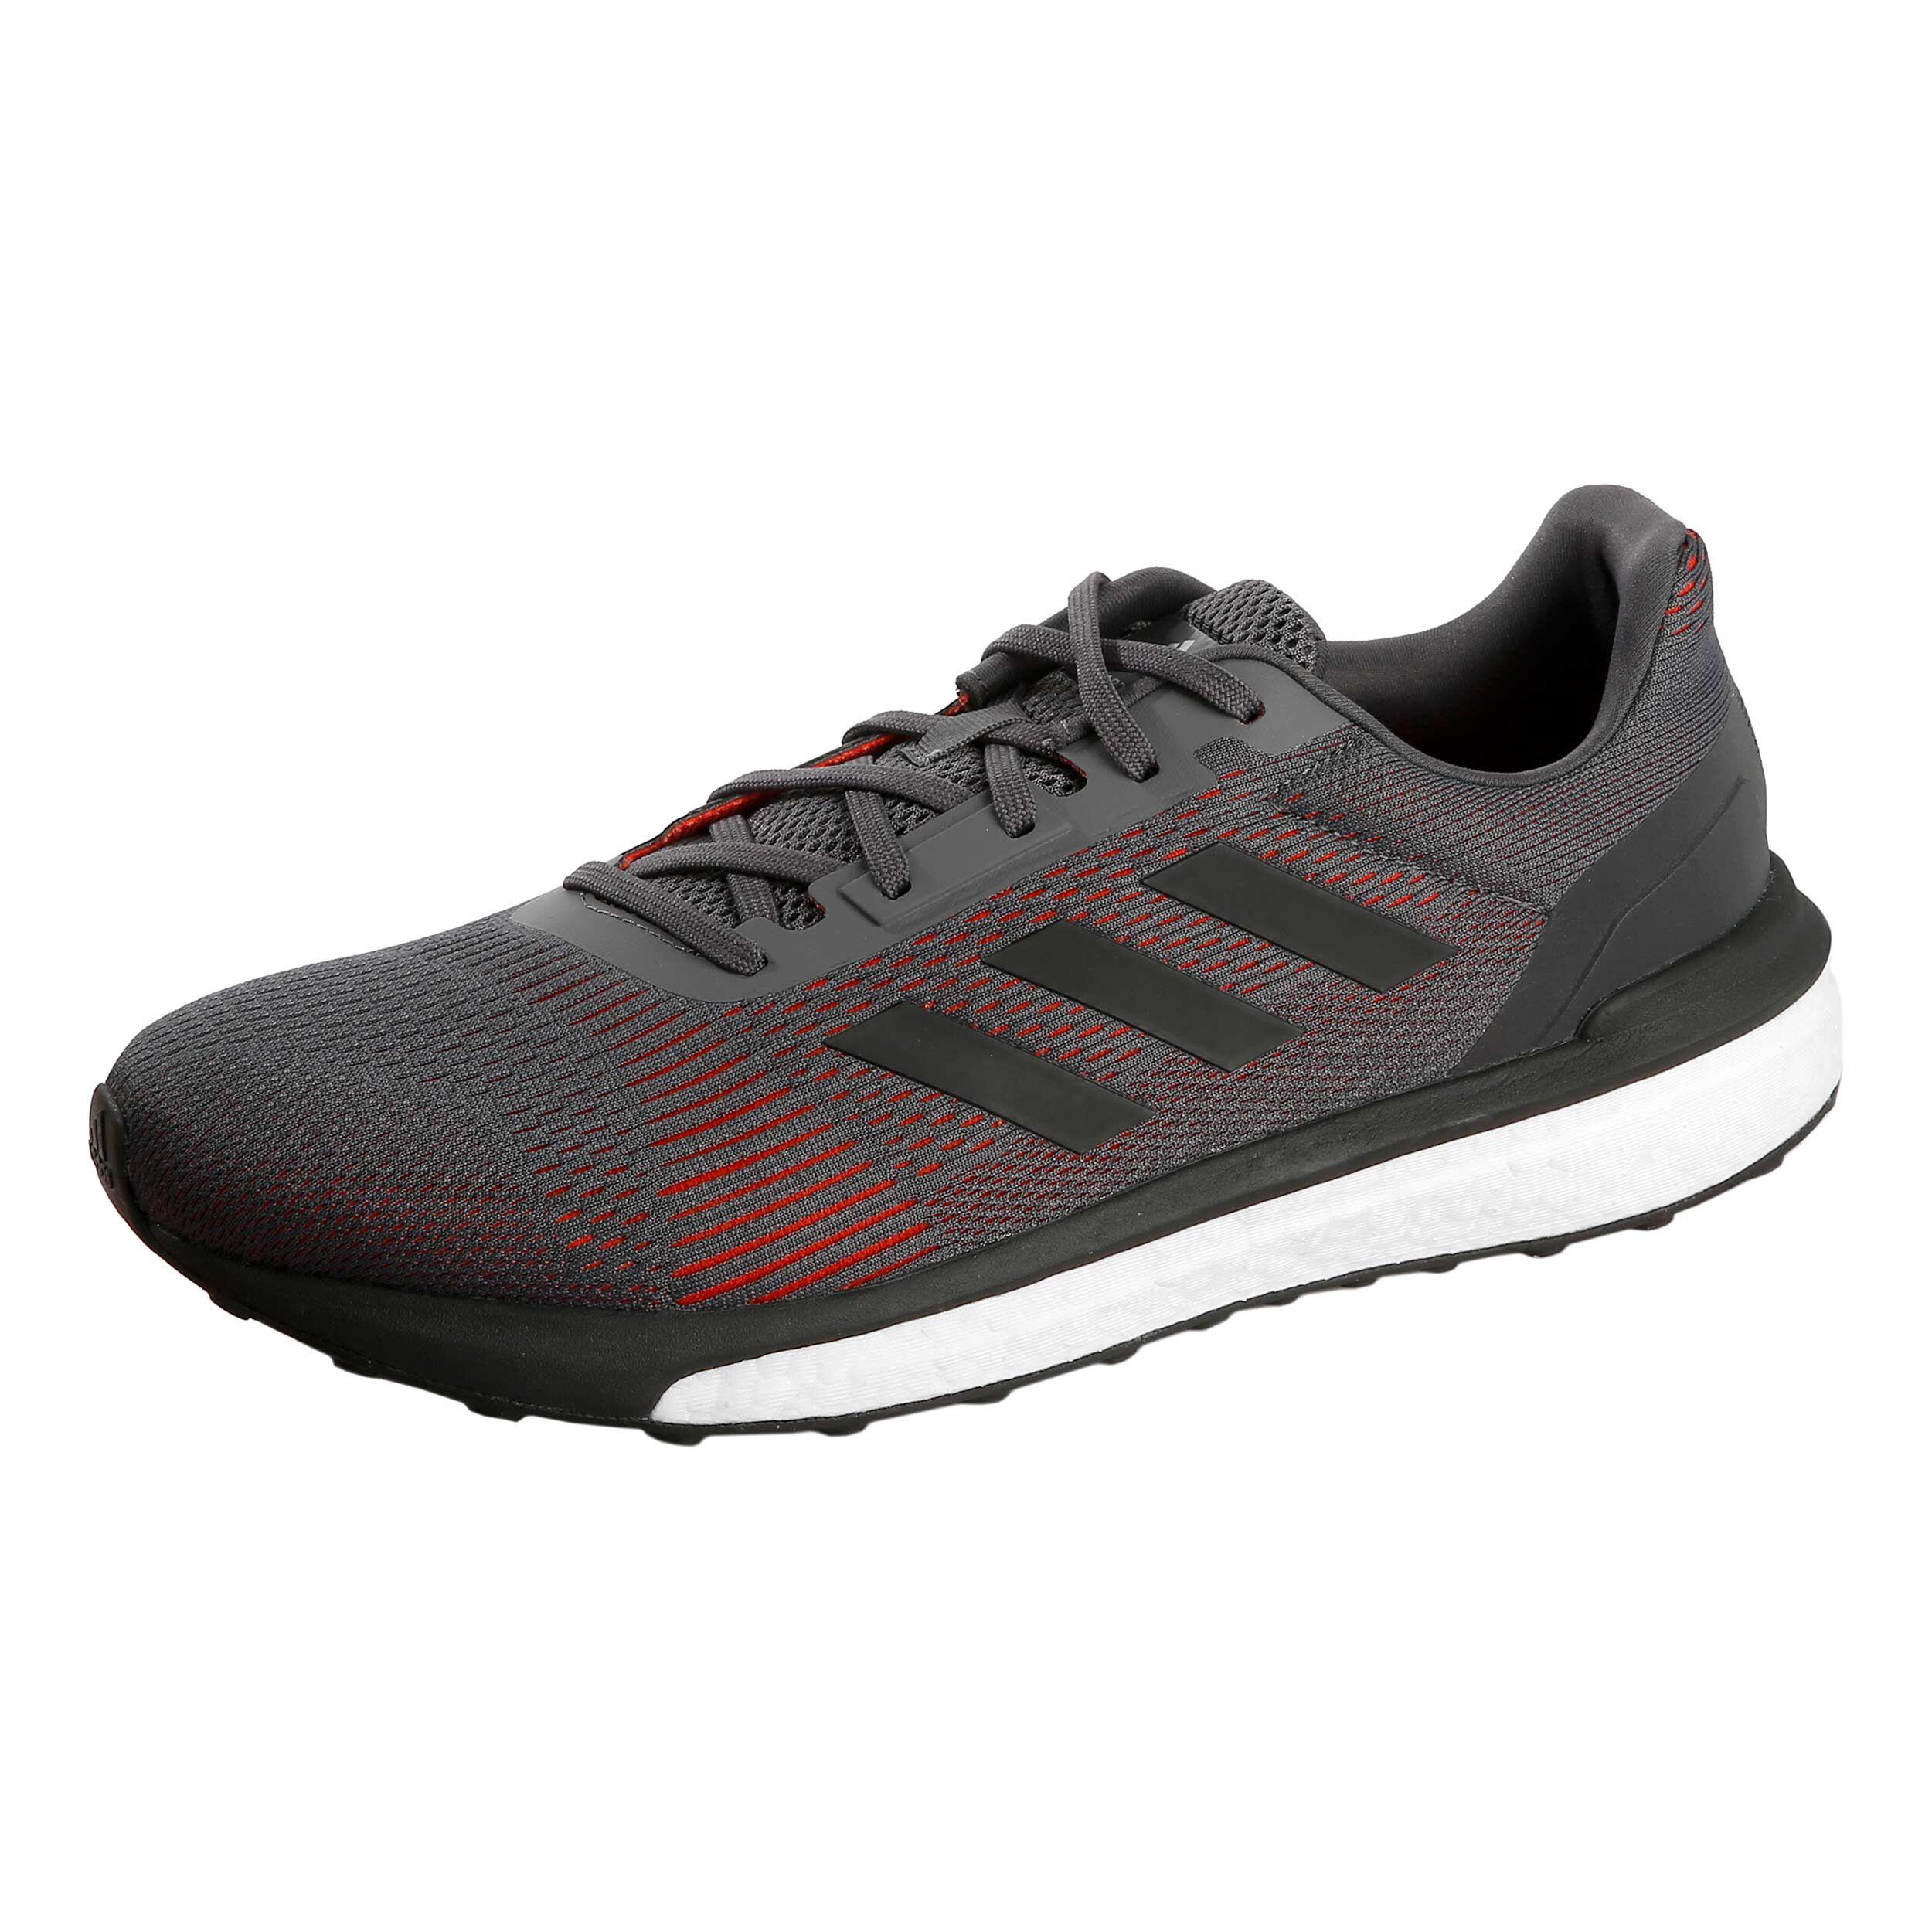 adidas; adidas ST adidas; Men Drive adidas; adidas; adidas; adidas; adidas; adidas; Solar axIwqH40